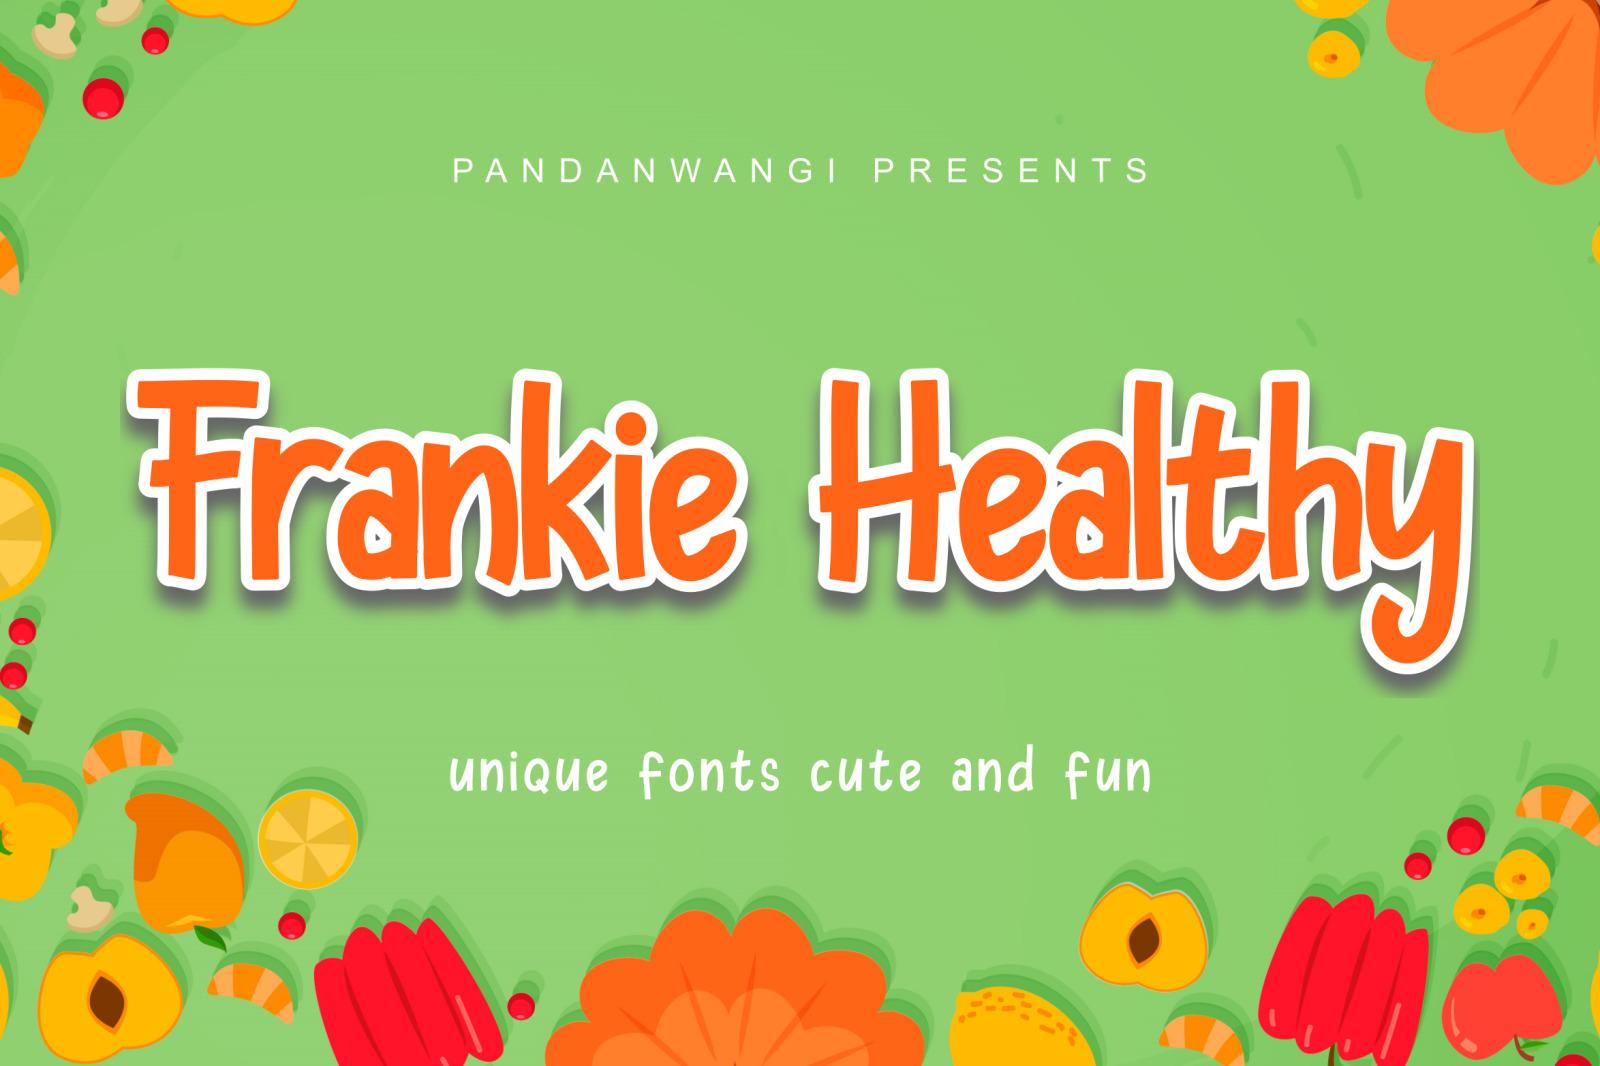 Frankie Healthy